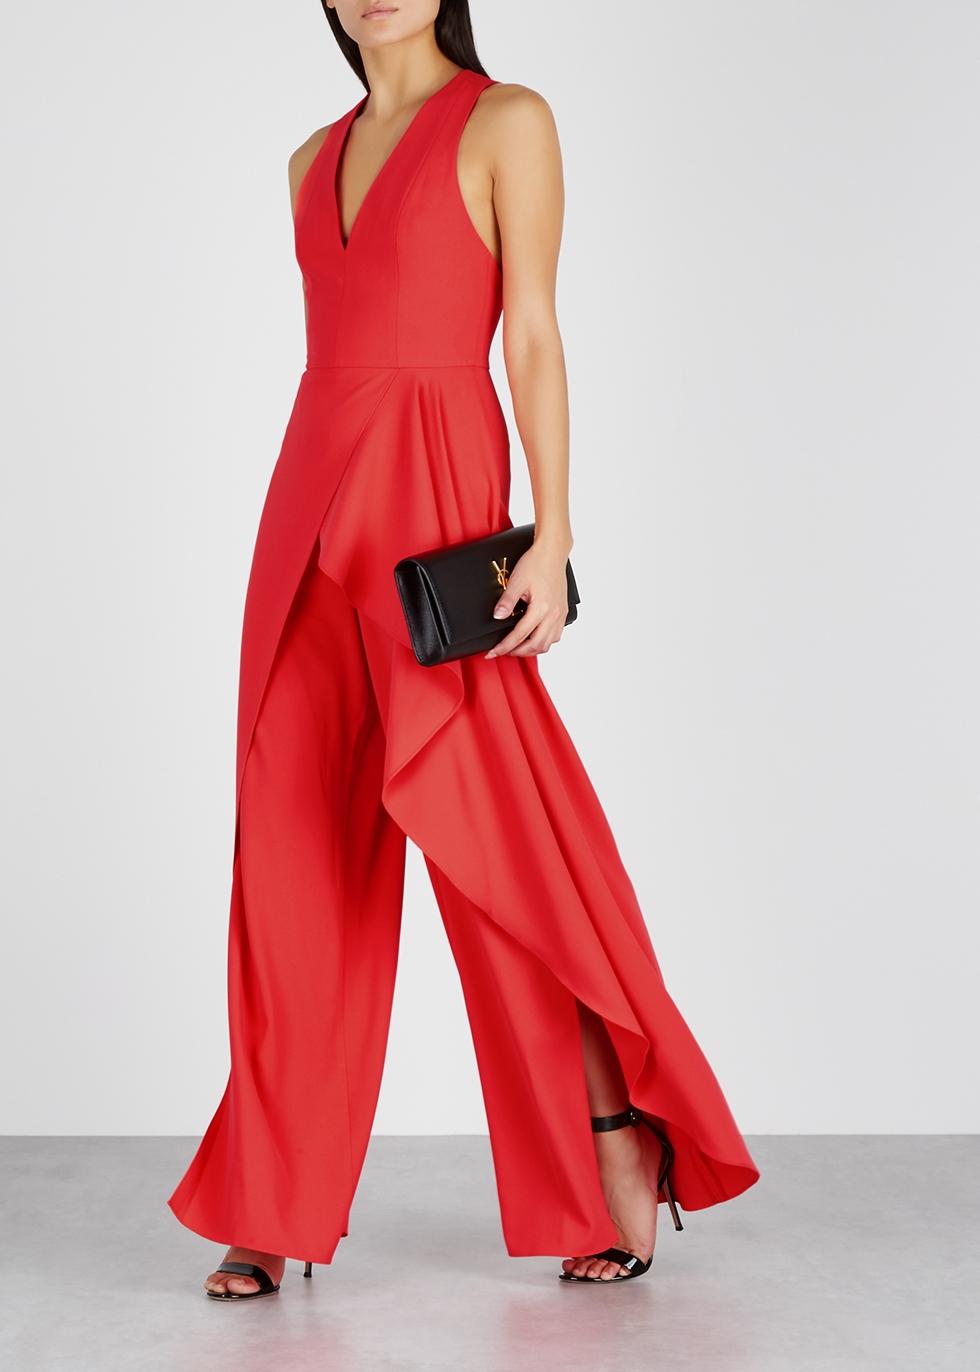 e4ef817e7a14 Designer Jumpsuits and Luxury Playsuits - Harvey Nichols